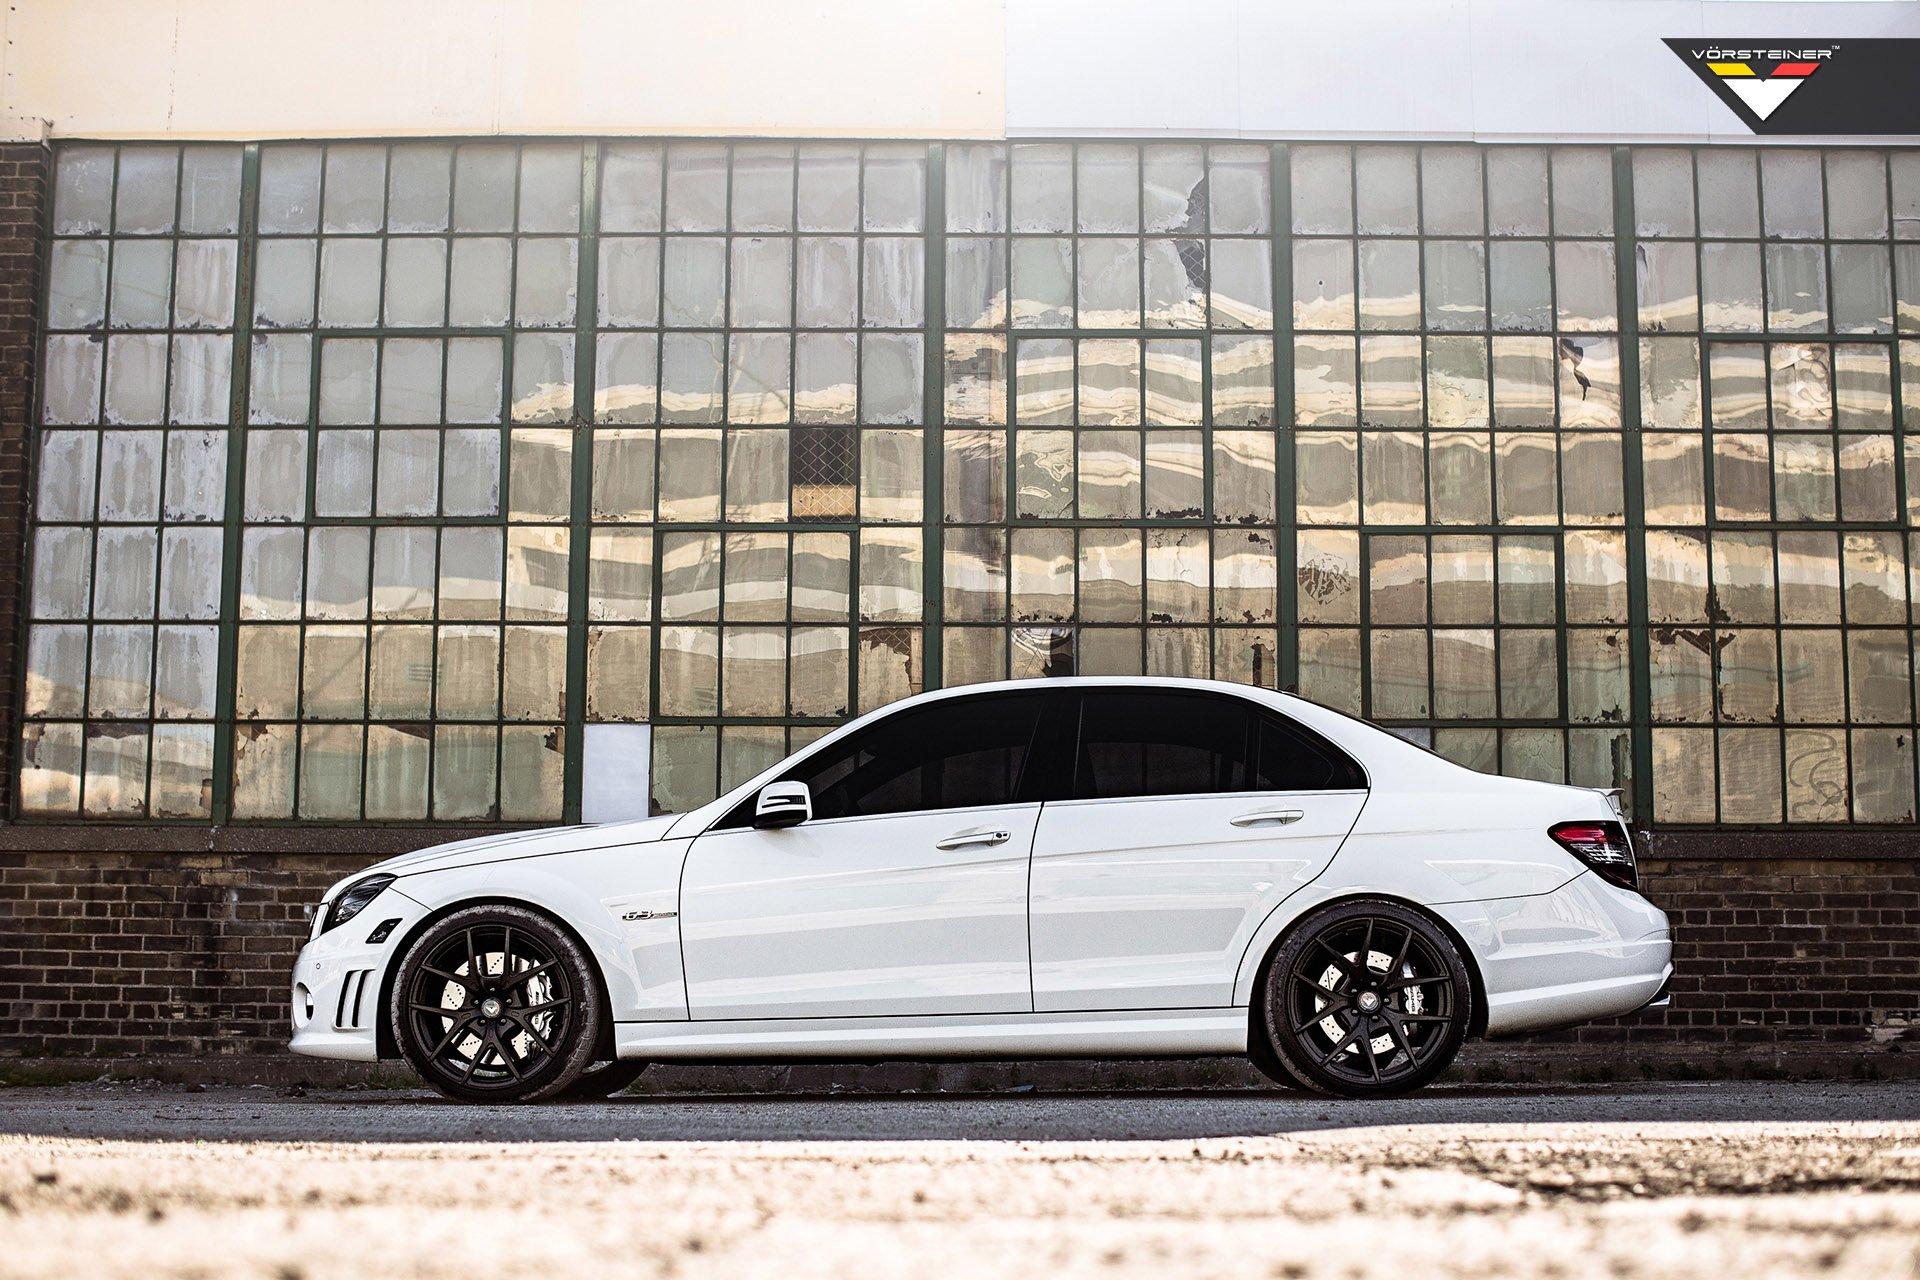 2014_vorsteiner_c63_amg_white_wheels_tuning_germany_cars_1920x1280.jpg